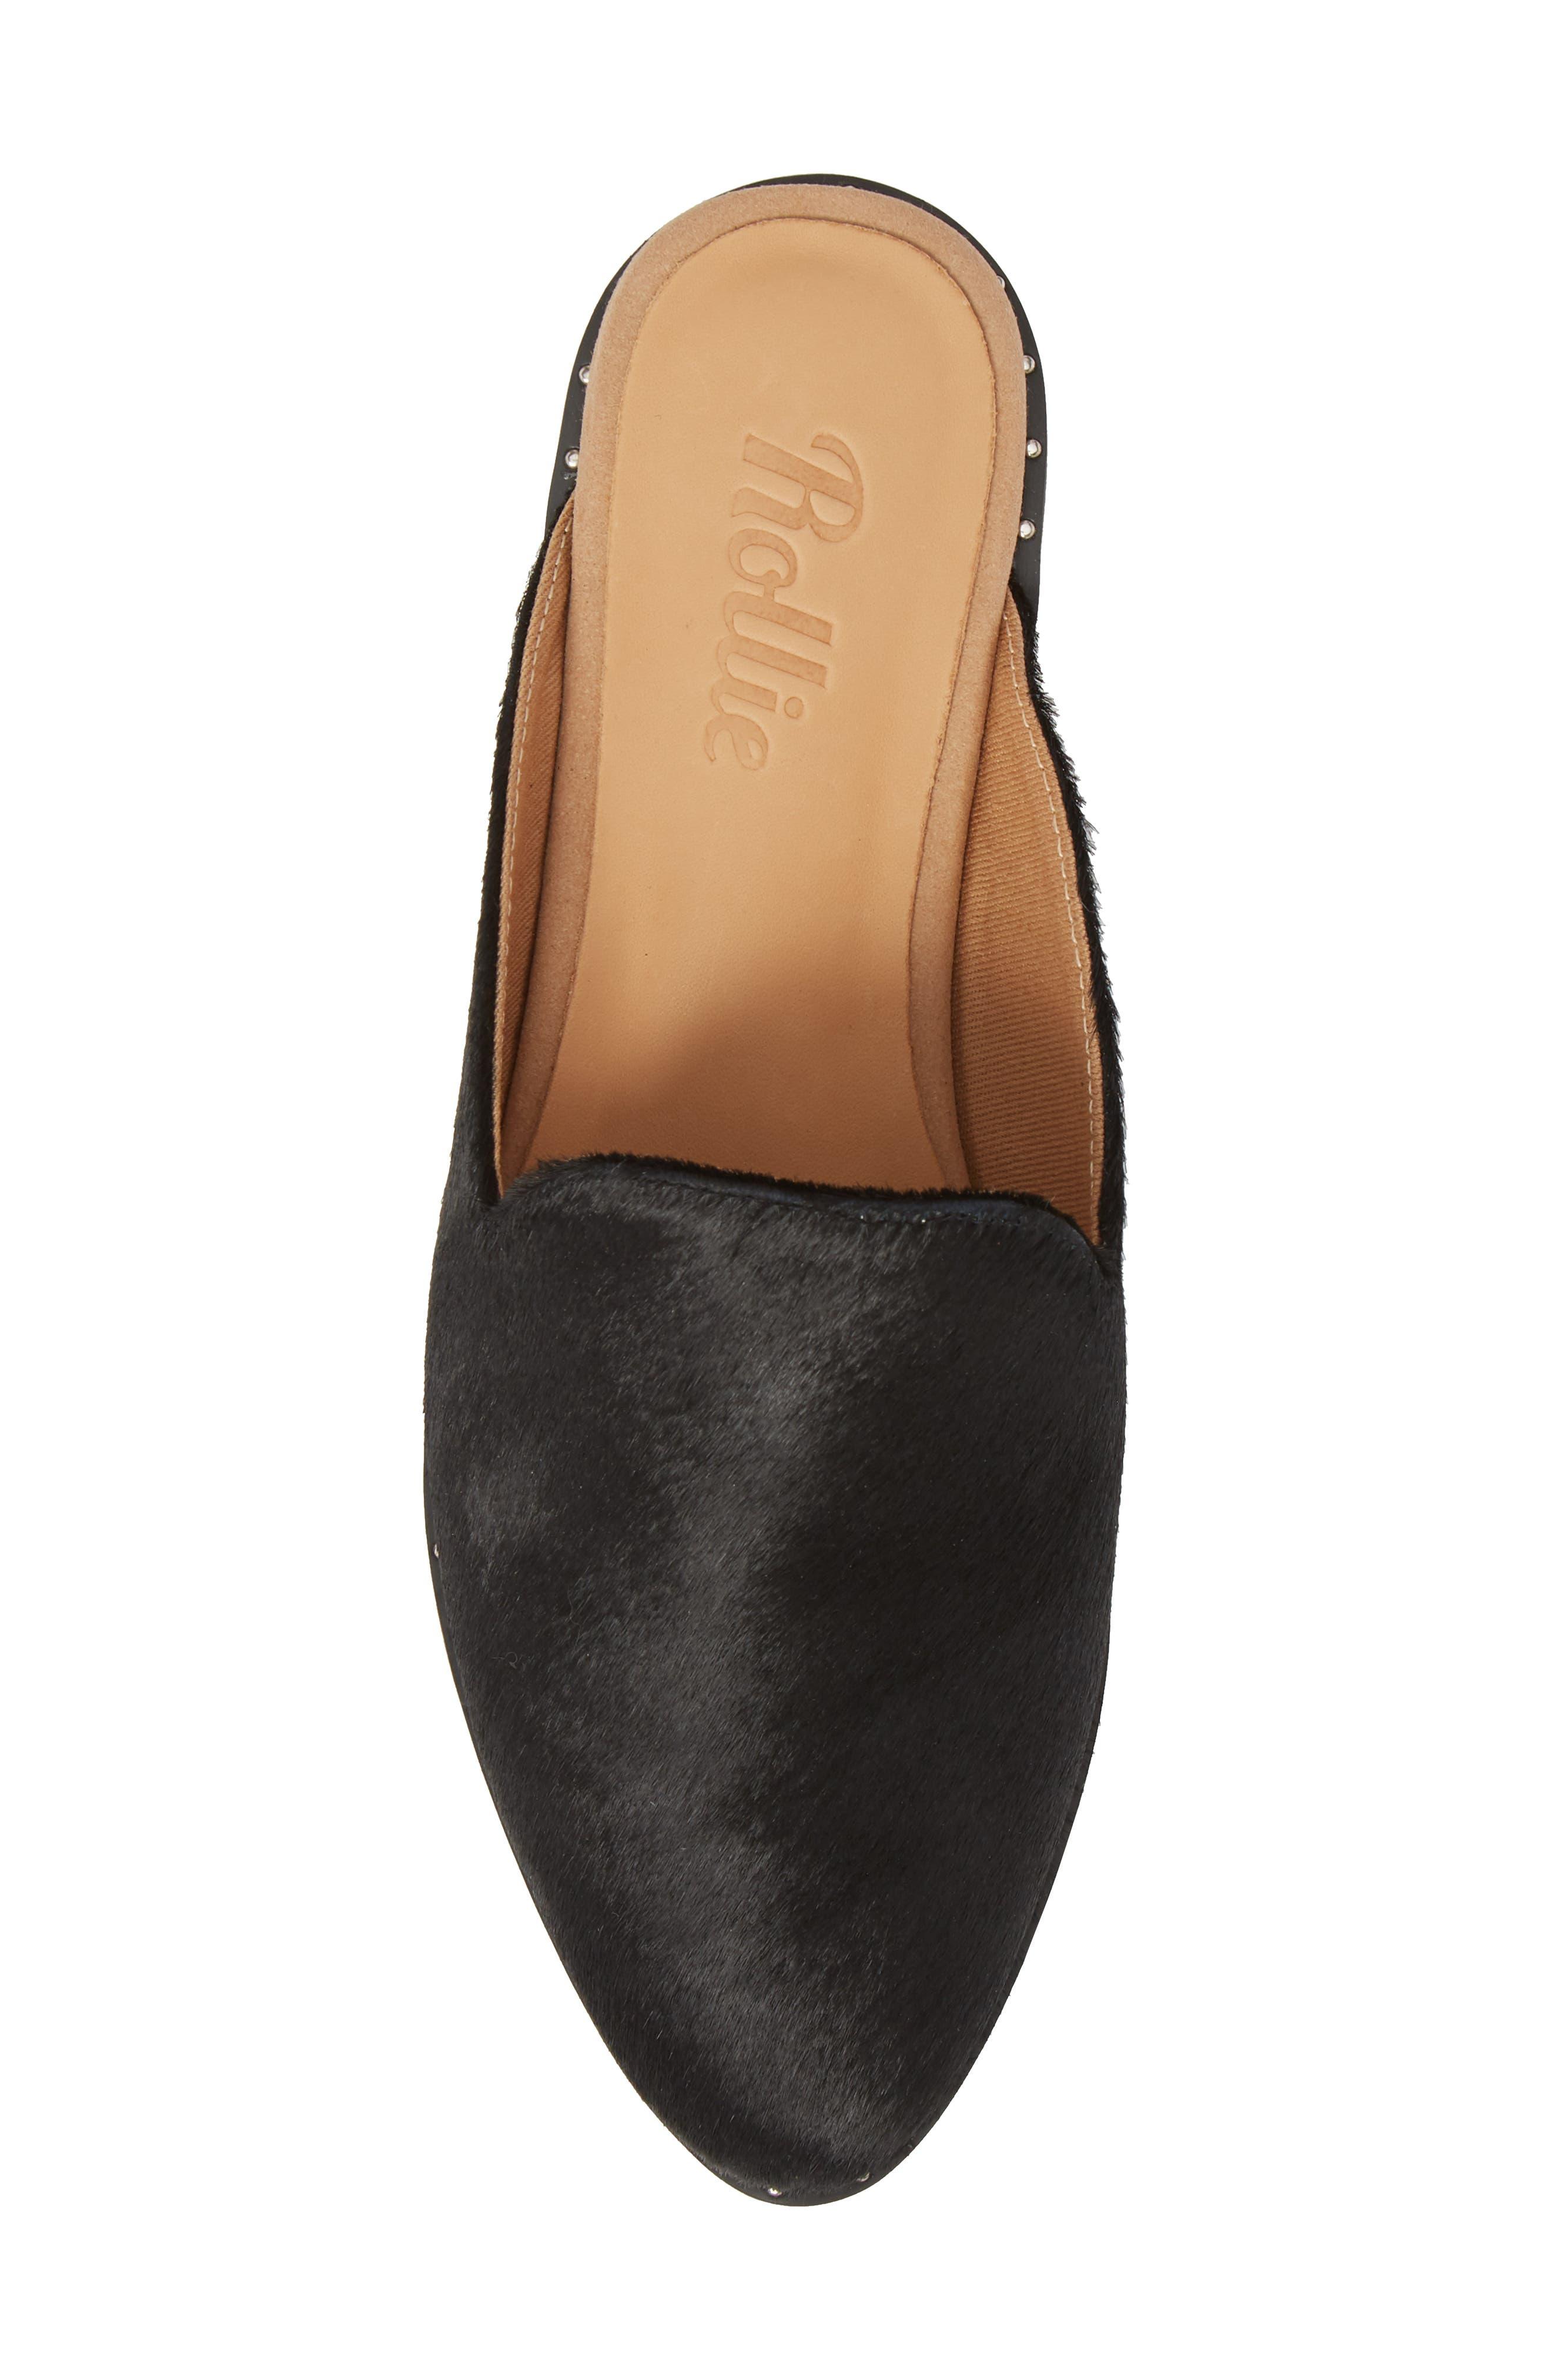 Madison Studded Genuine Calf Hair Loafer Mule,                             Alternate thumbnail 5, color,                             Black Calf Hair